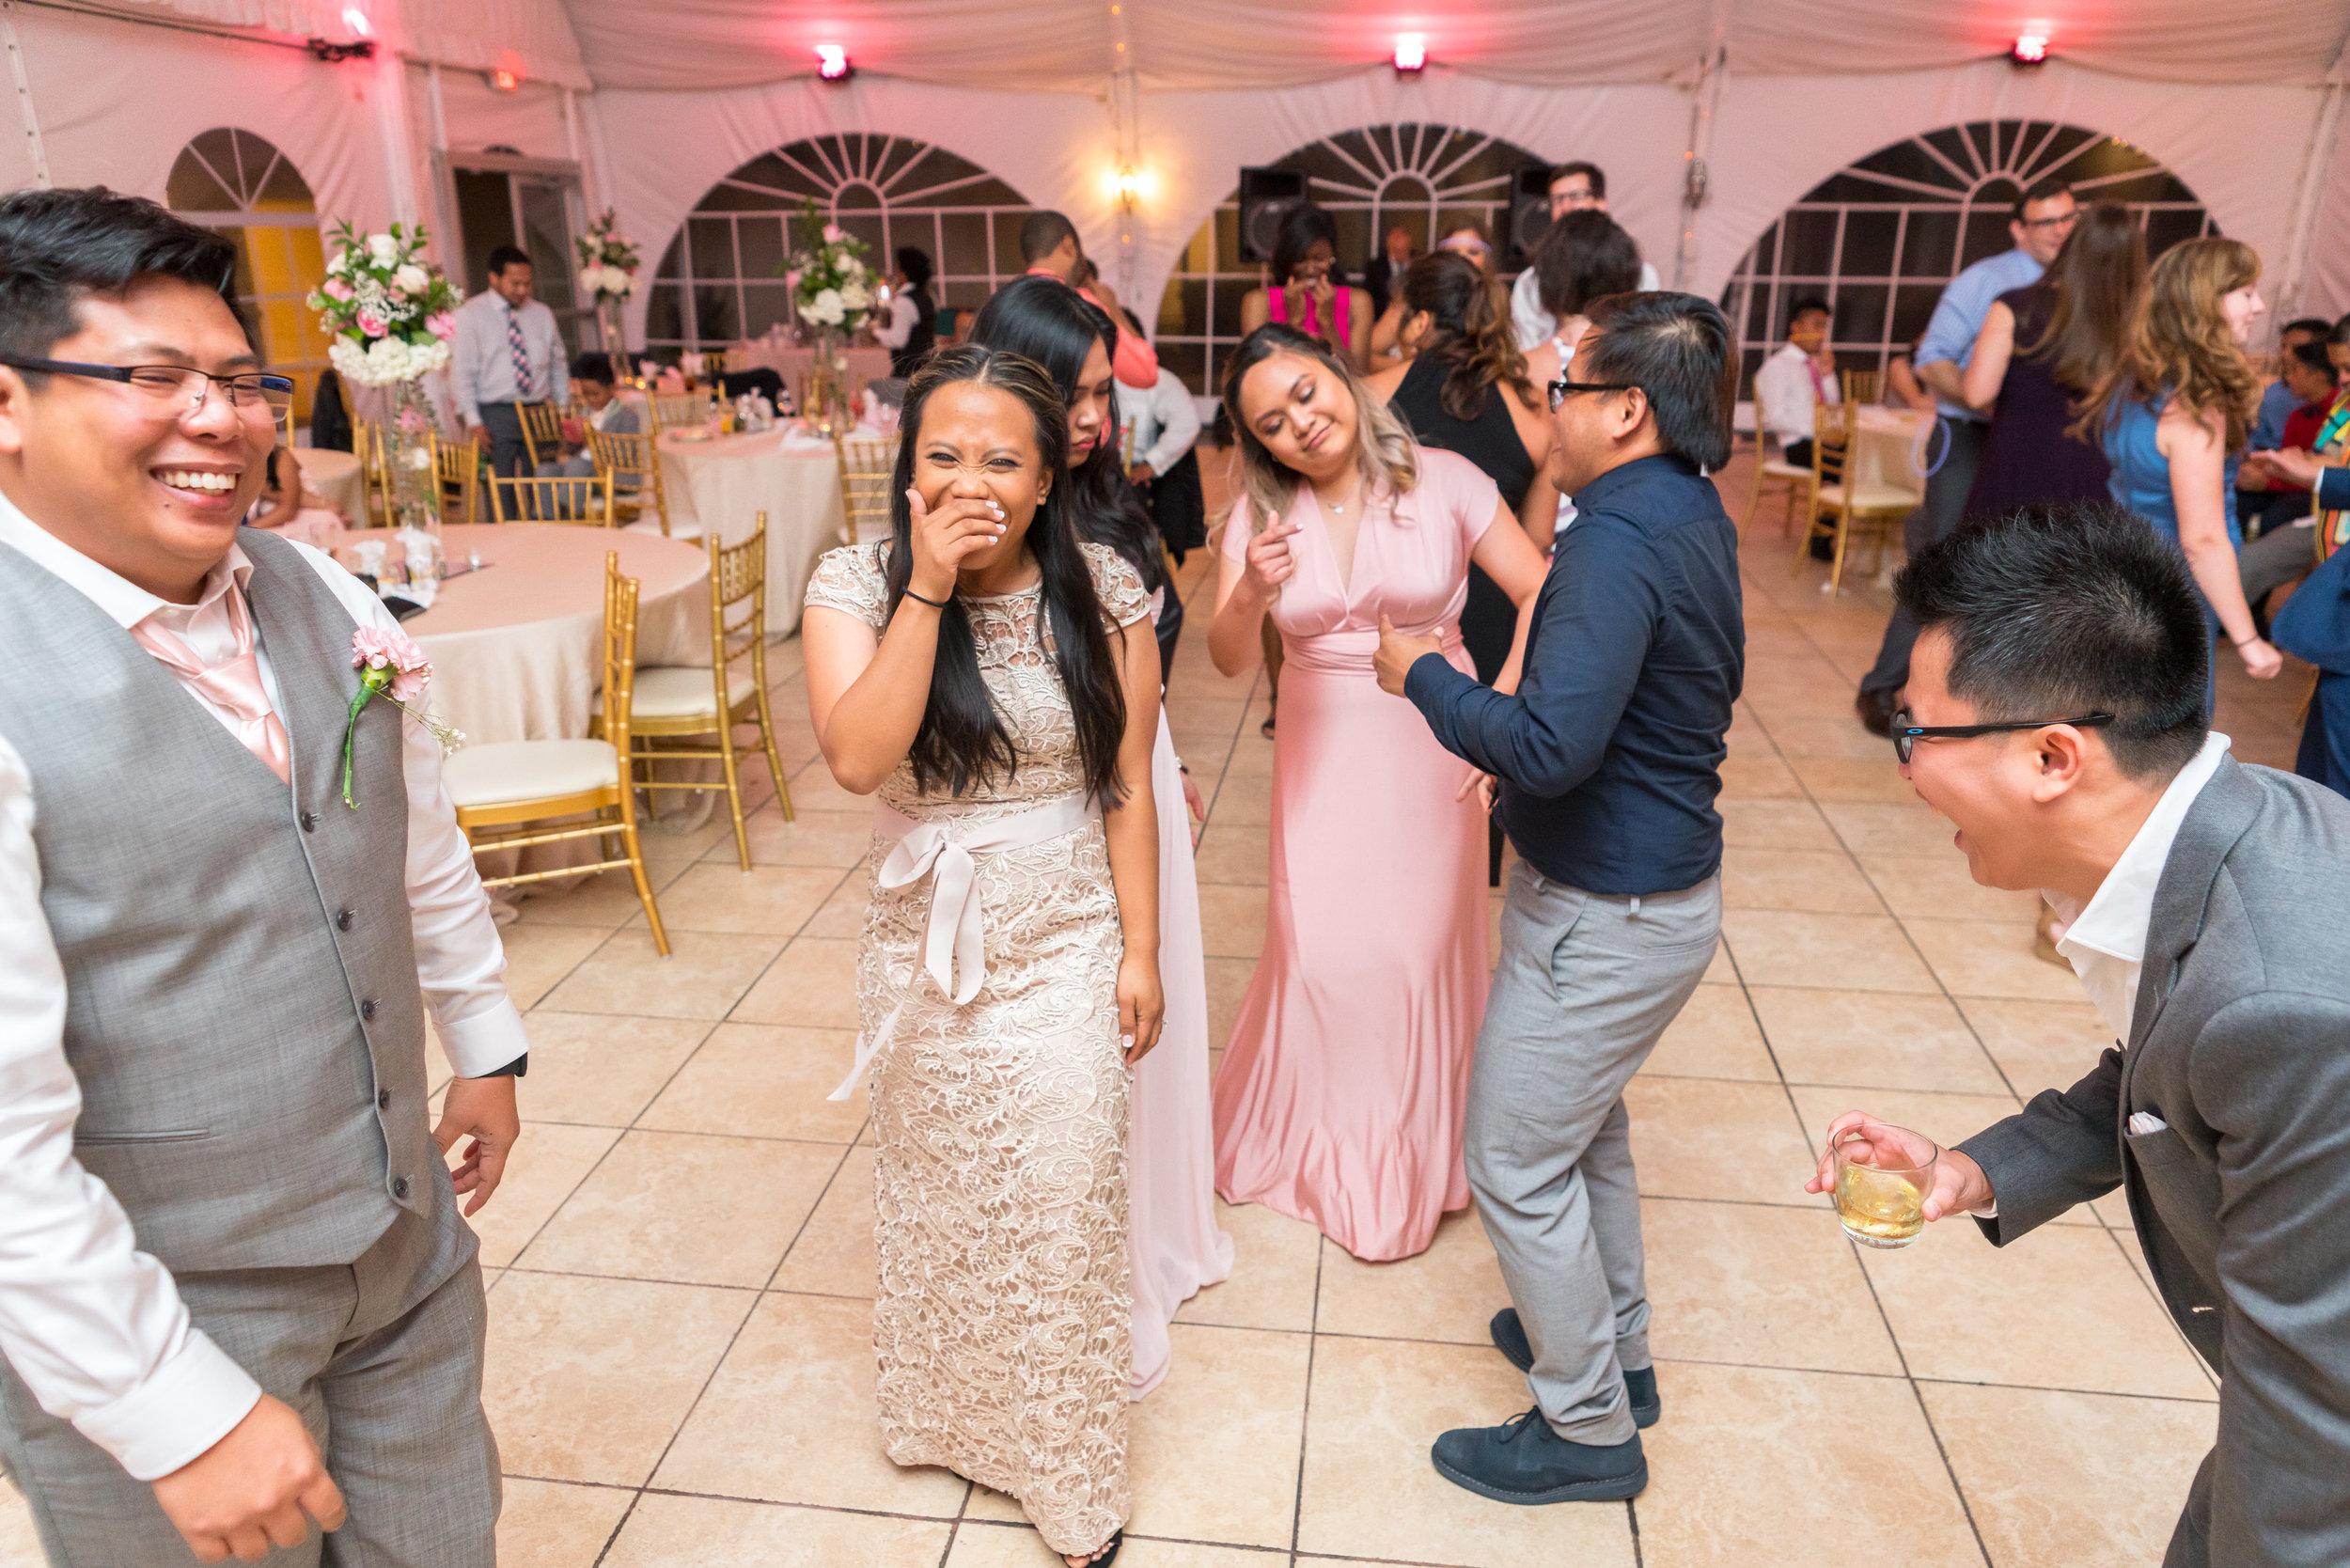 Wedding reception at The Villa in Maryland